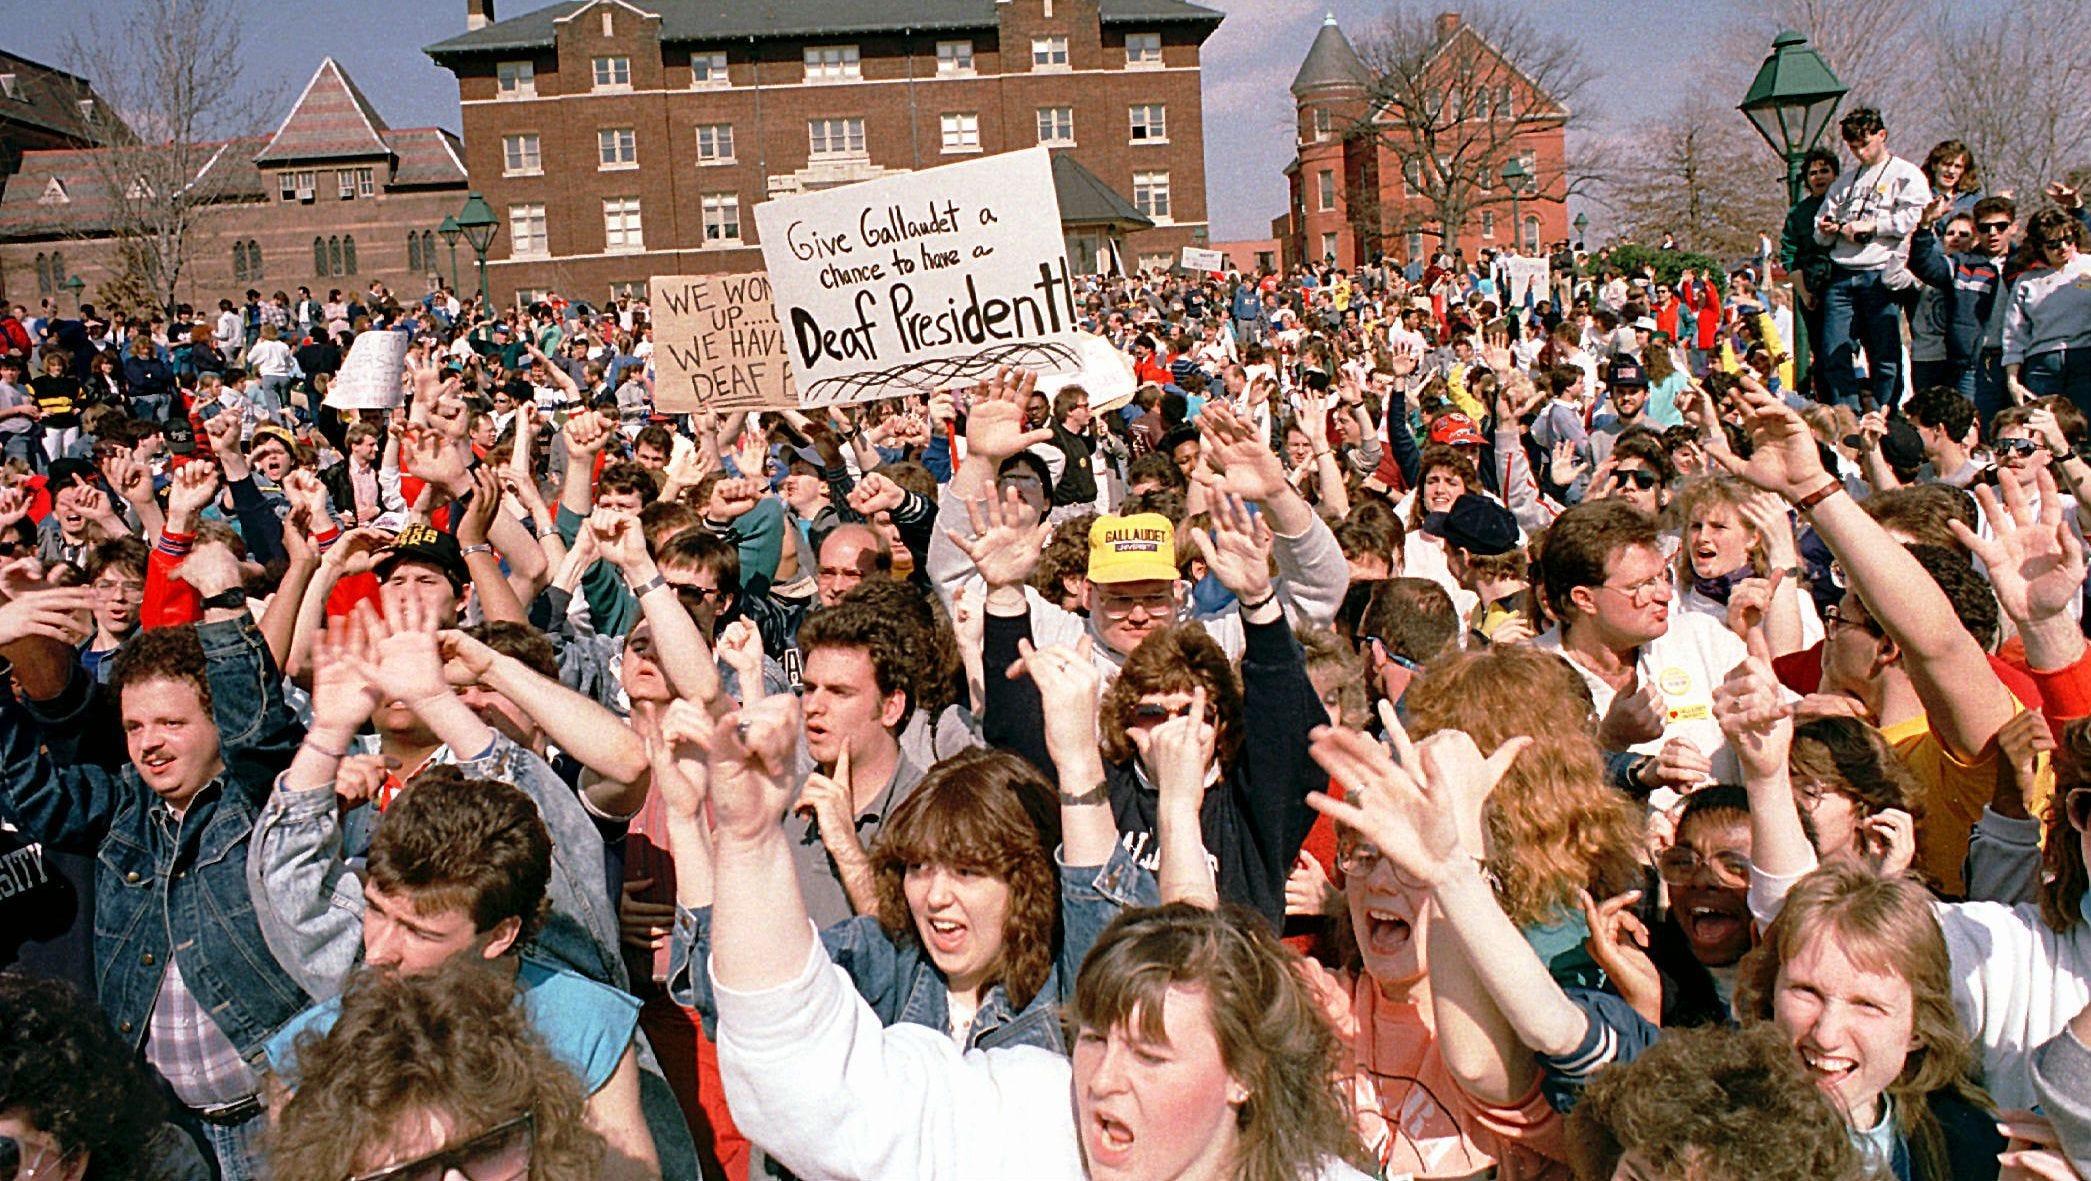 1988: Deaf President Now (USA)